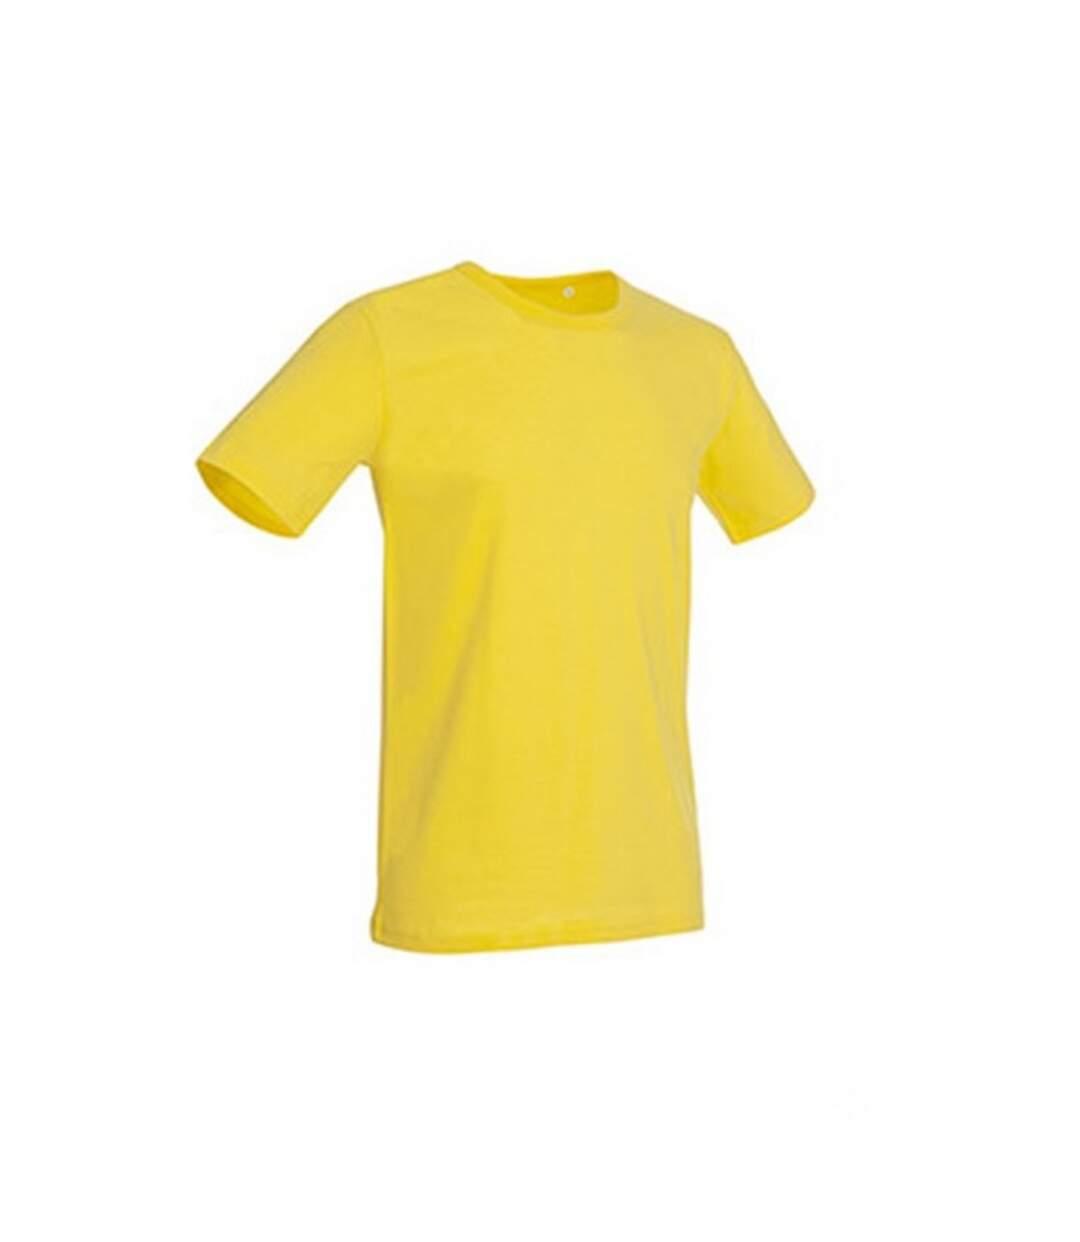 Stedman Stars Mens Morgan Crew Neck Tee (Daisy Yellow) - UTAB357